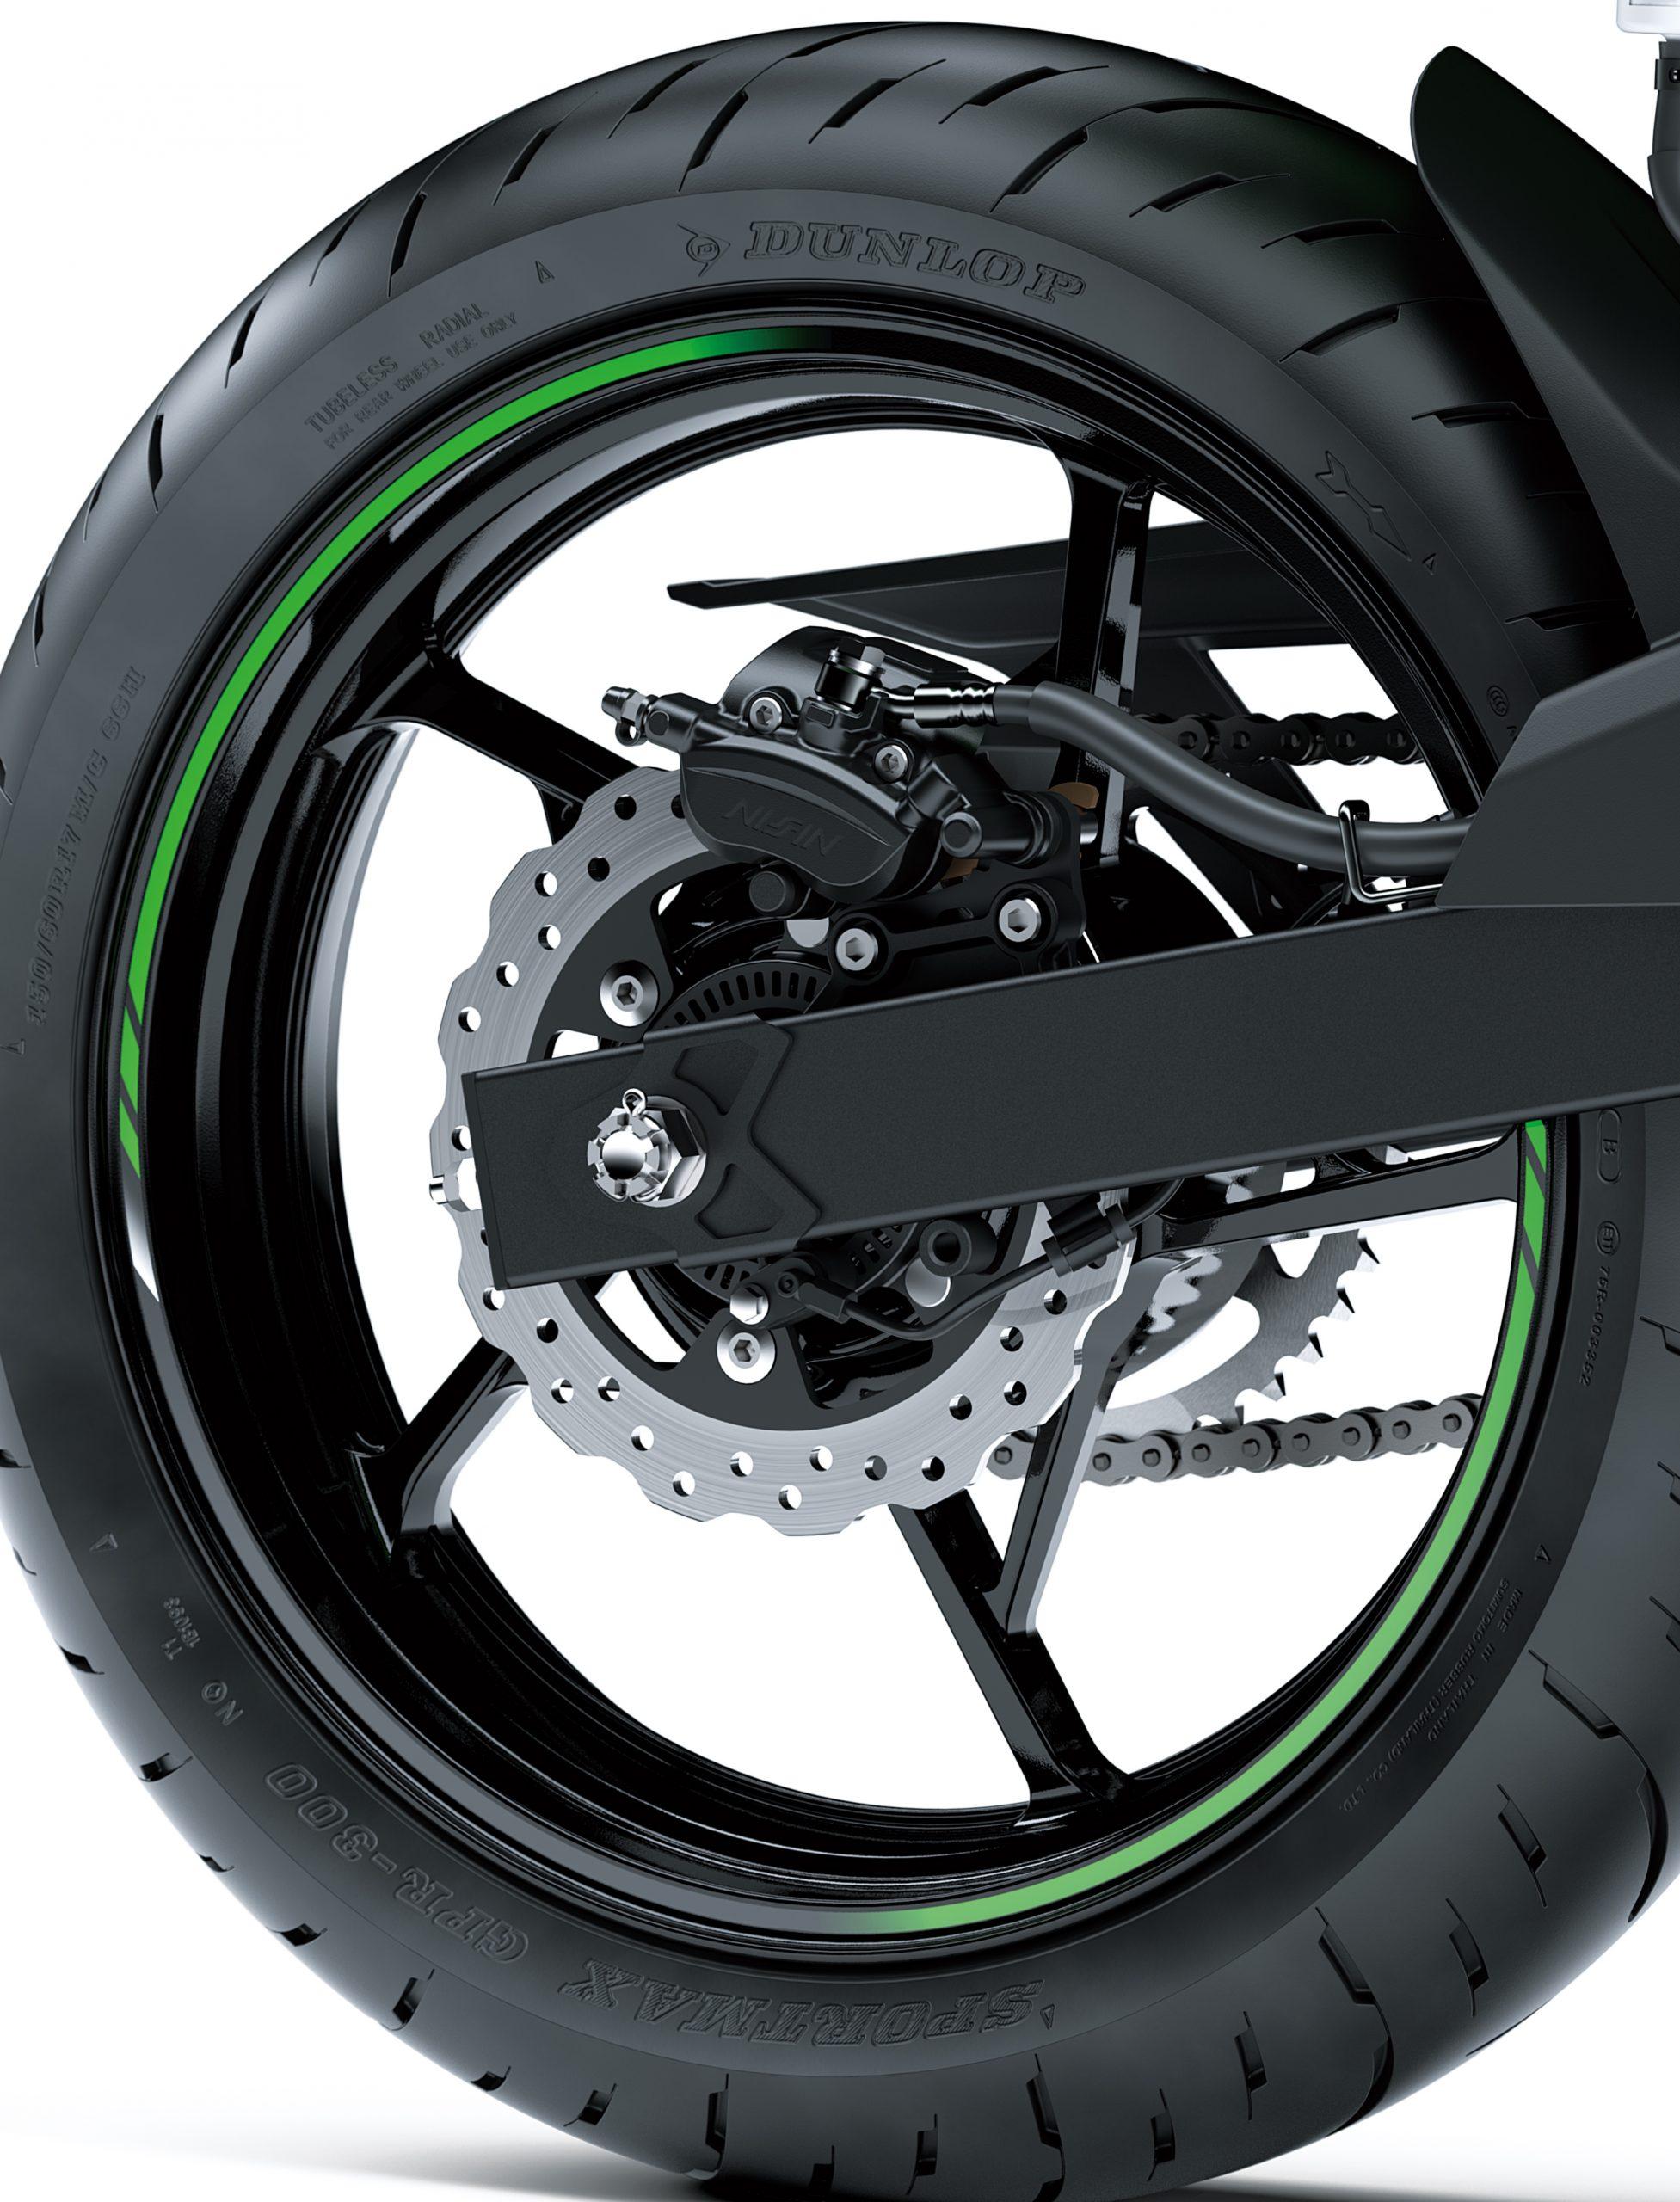 Ninja 400 – Details (6)